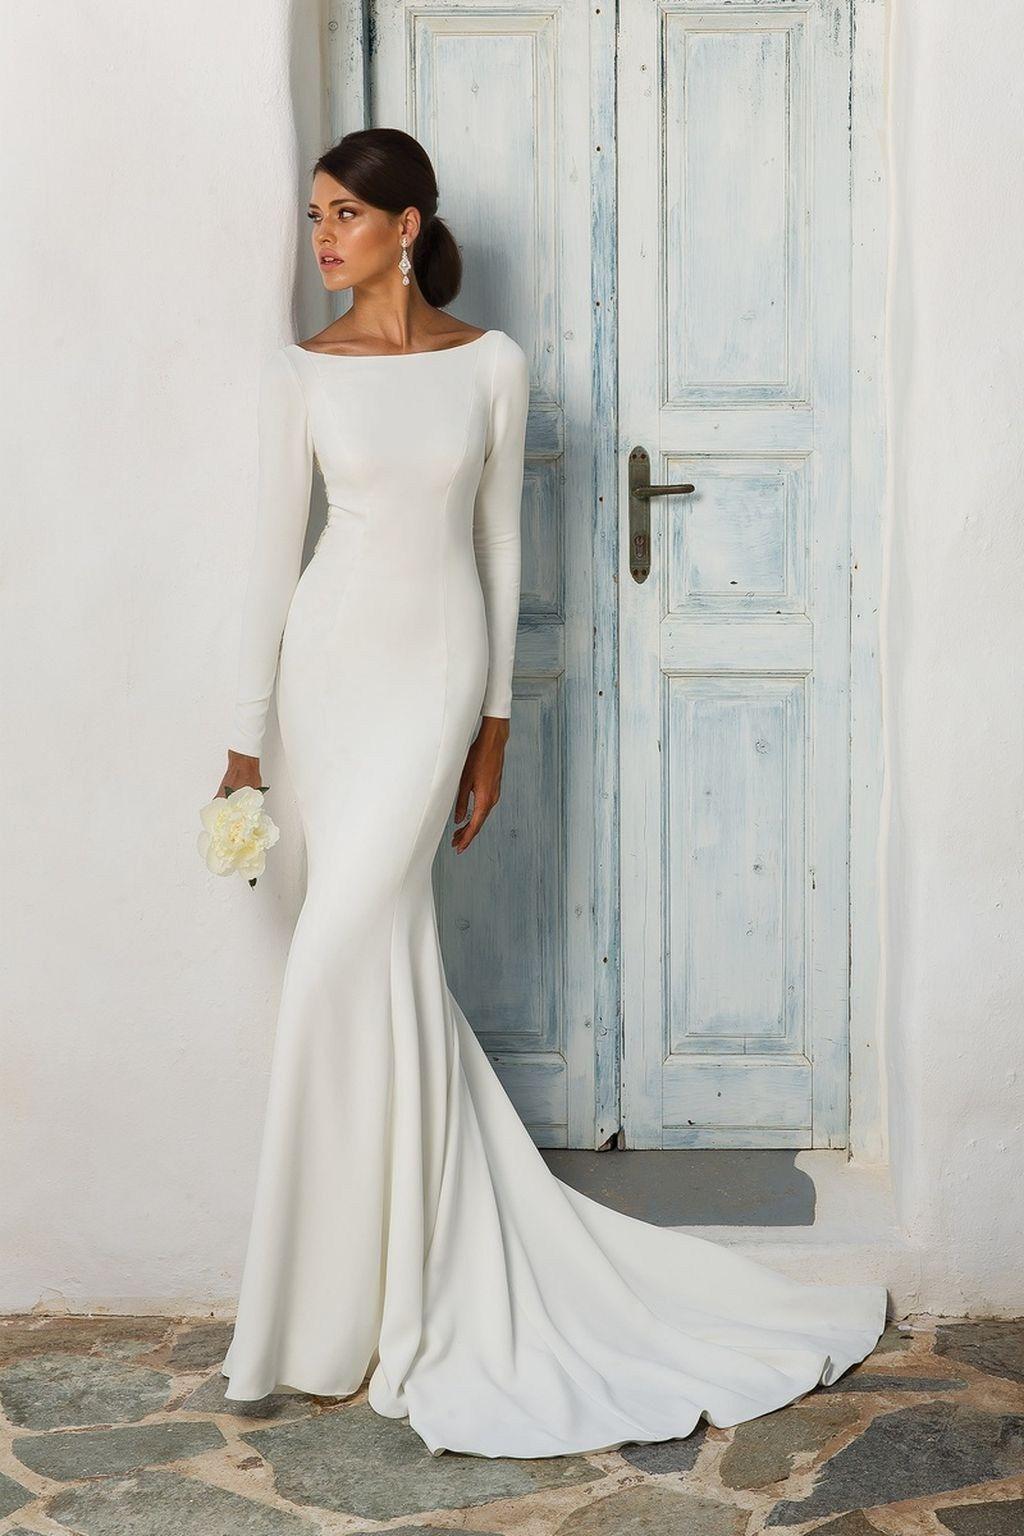 Totally Adorable Long Sleeve Winter Wedding Dress Ideas Every Women Want 26 Weddingdress Cowl Back Wedding Dress Sleek Wedding Dress Wedding Dress Long Sleeve [ 1536 x 1024 Pixel ]